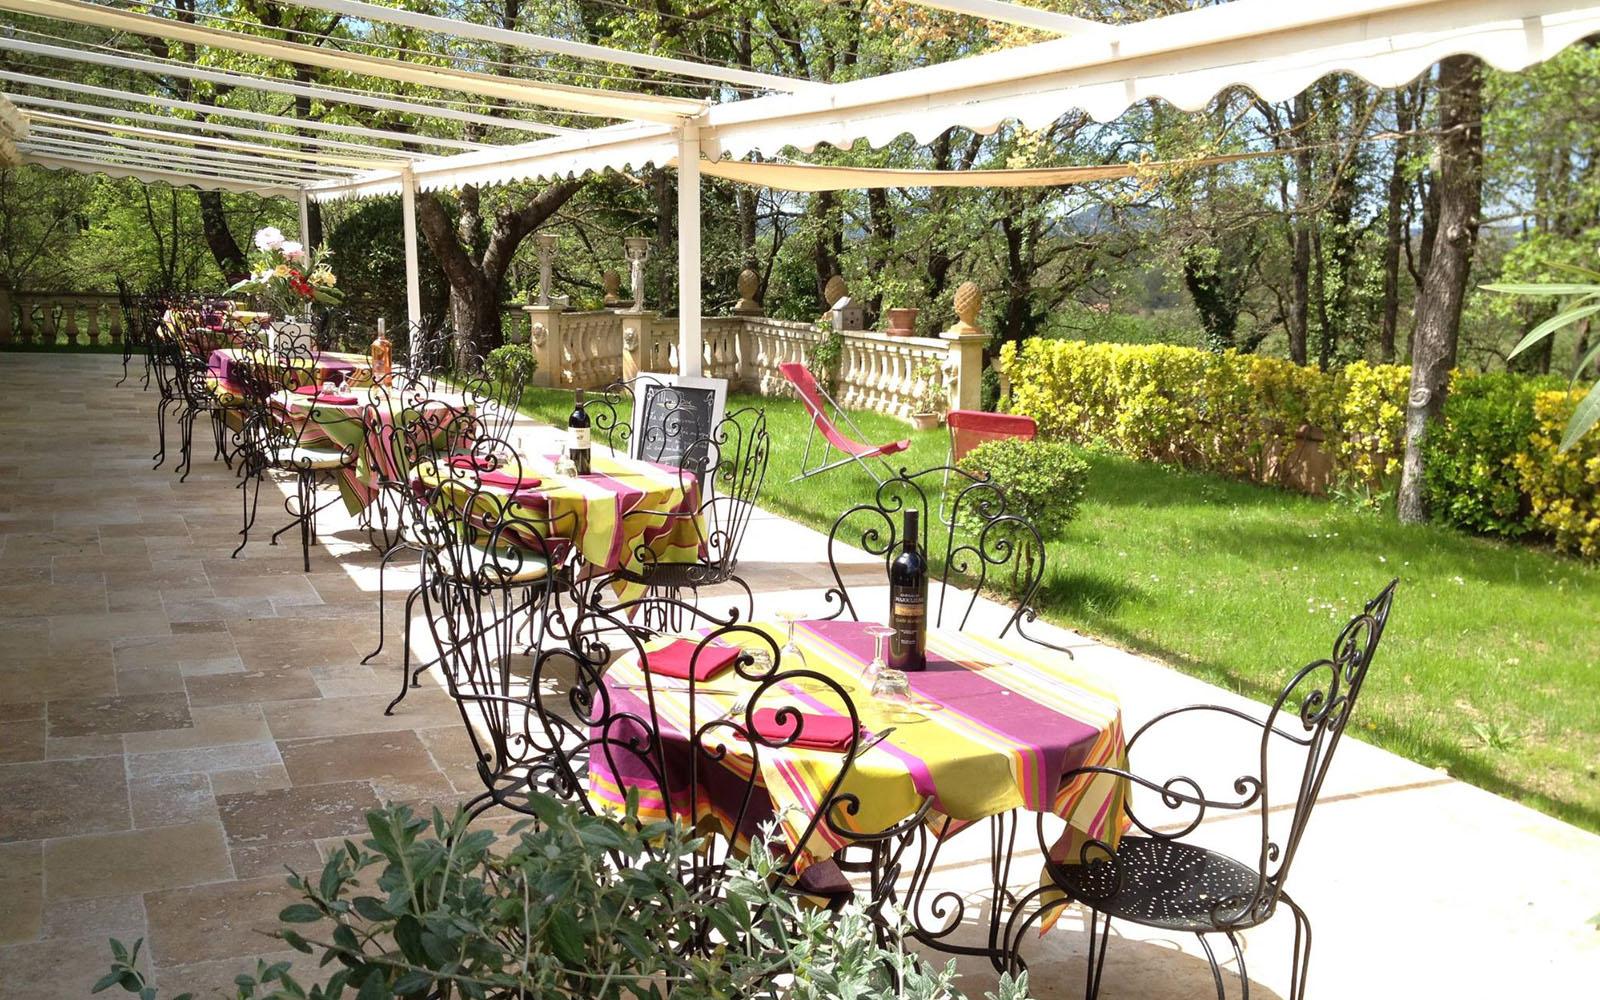 La veranda esterna del ristorante Au Bien Etre.